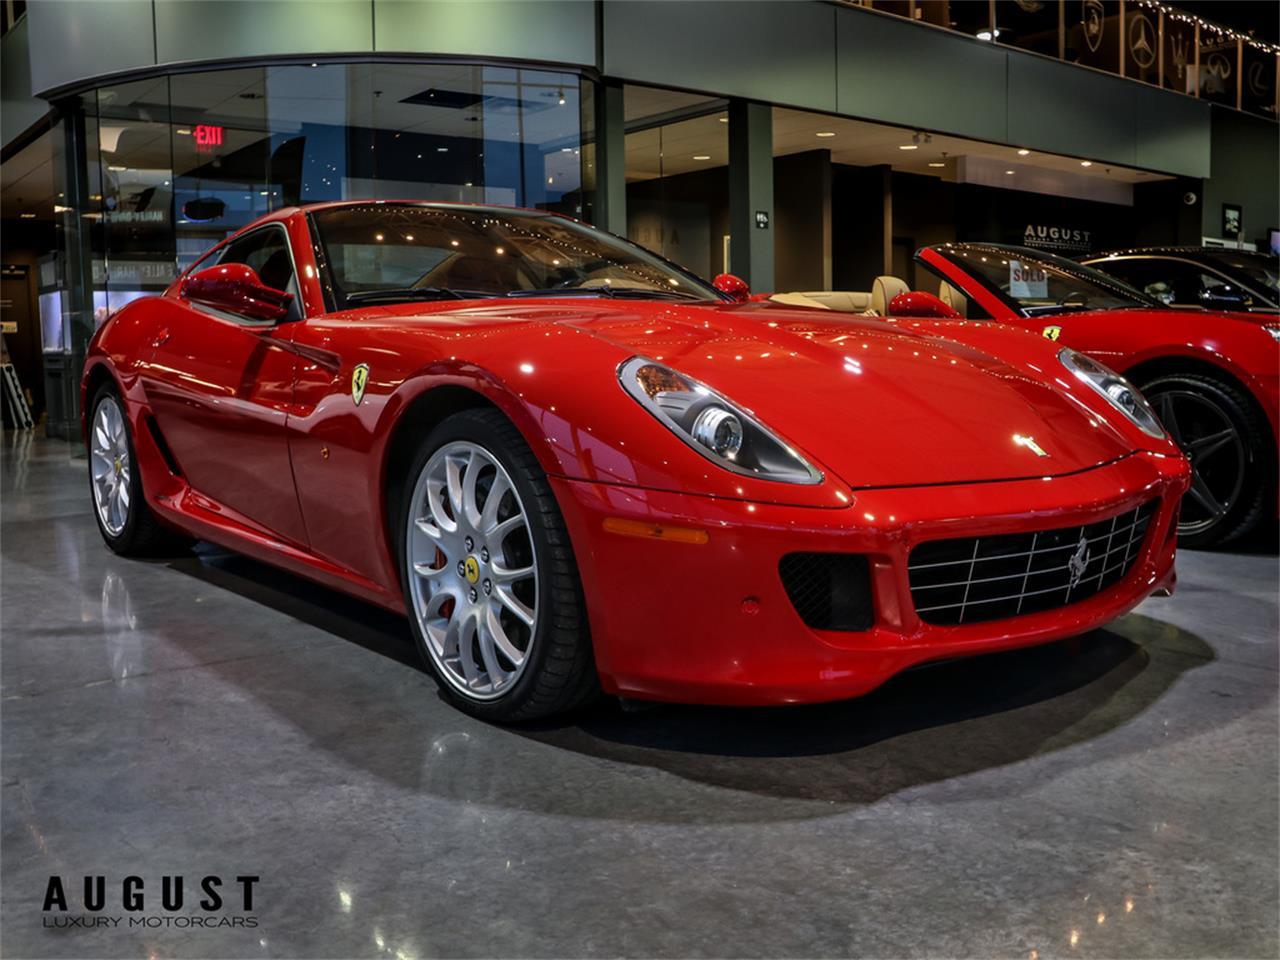 2008 Ferrari 599 (CC-1235300) for sale in Kelowna, British Columbia